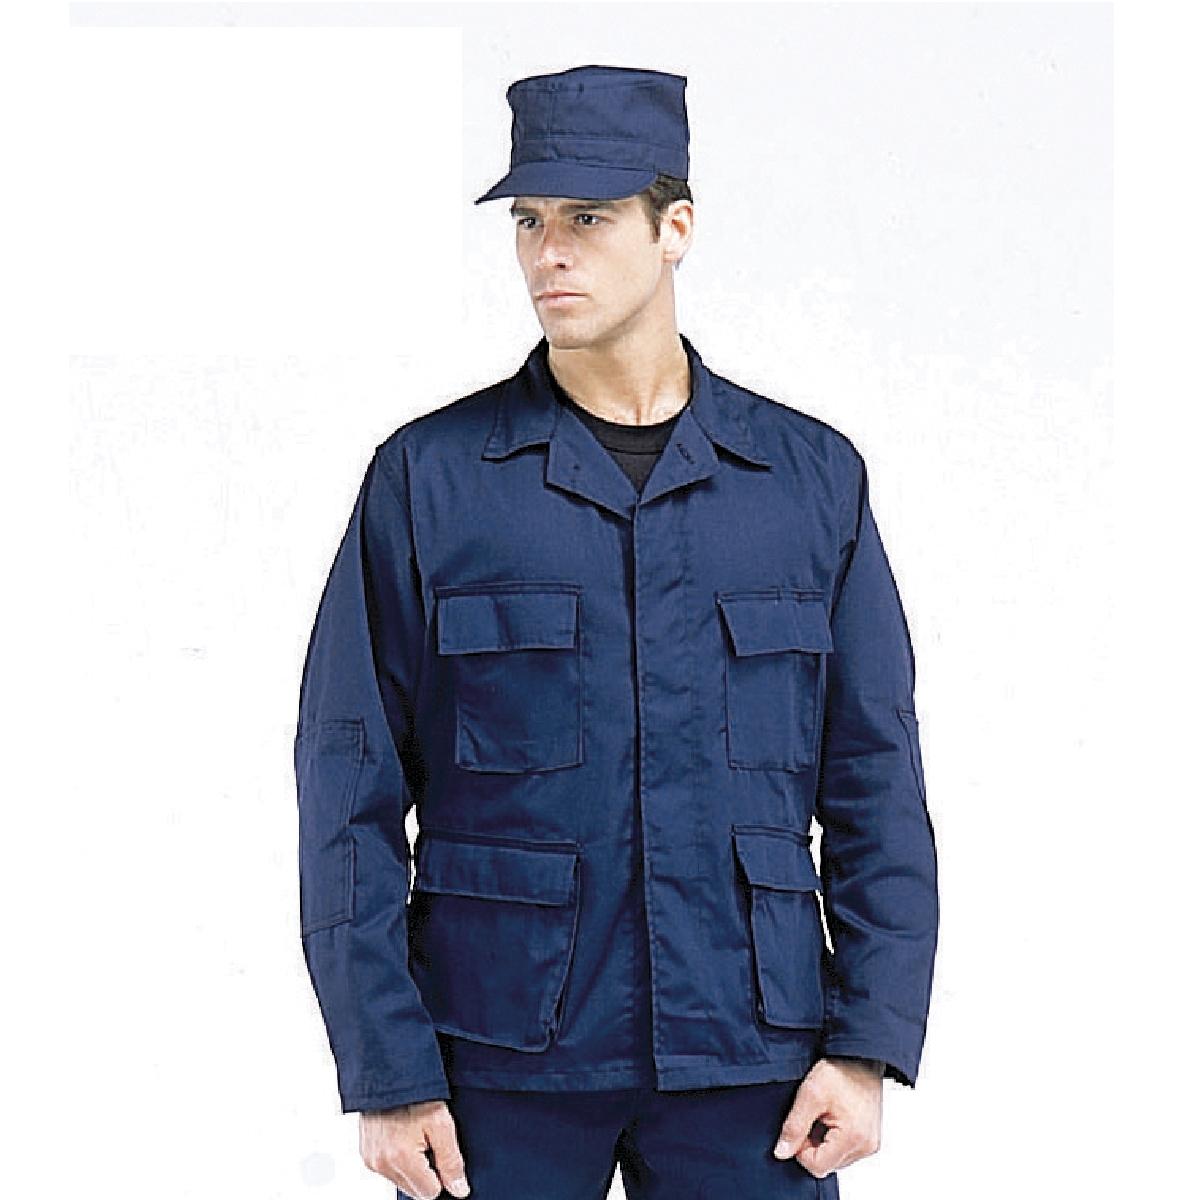 Rothco Midnight Blue BDU Shirts, Military Uniform Shirts